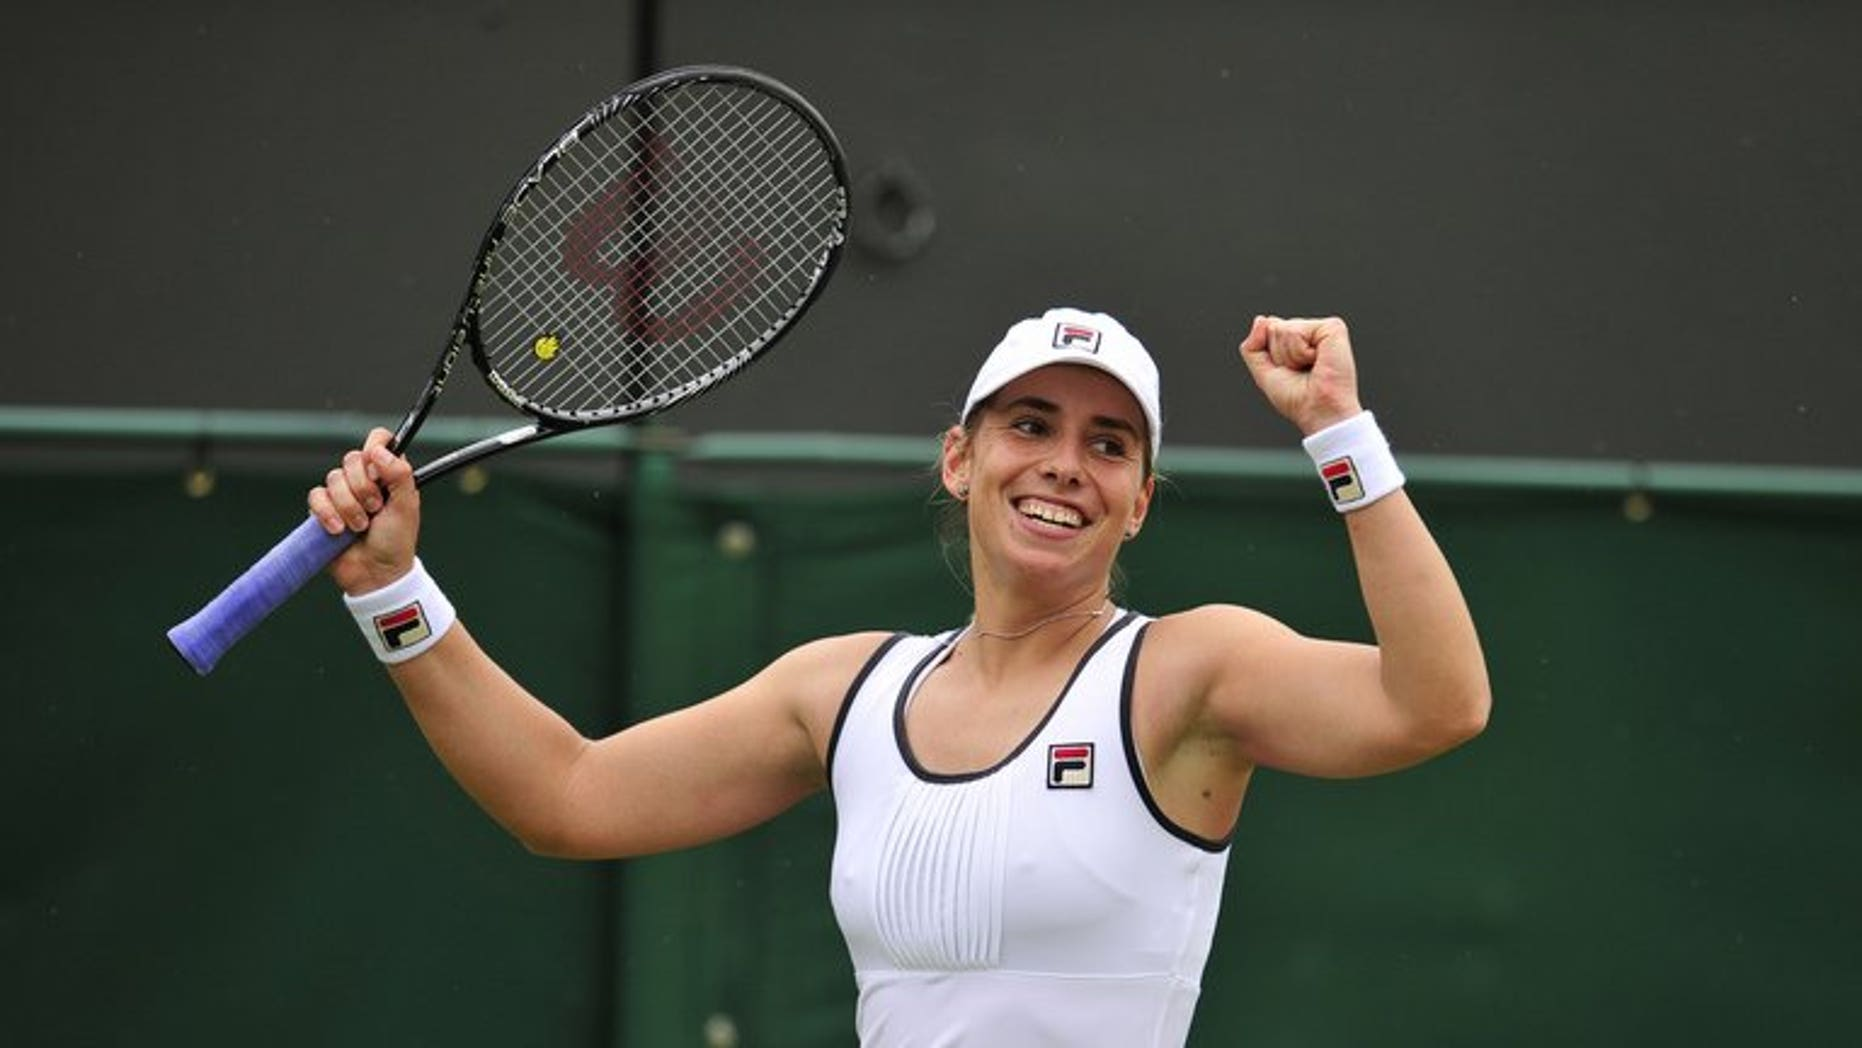 New Zealand's Marina Erakovic celebrates beating China's Peng Shuai during the 2013 Wimbledon Championships in Wimbledon, southwest London, on June 27, 2013.